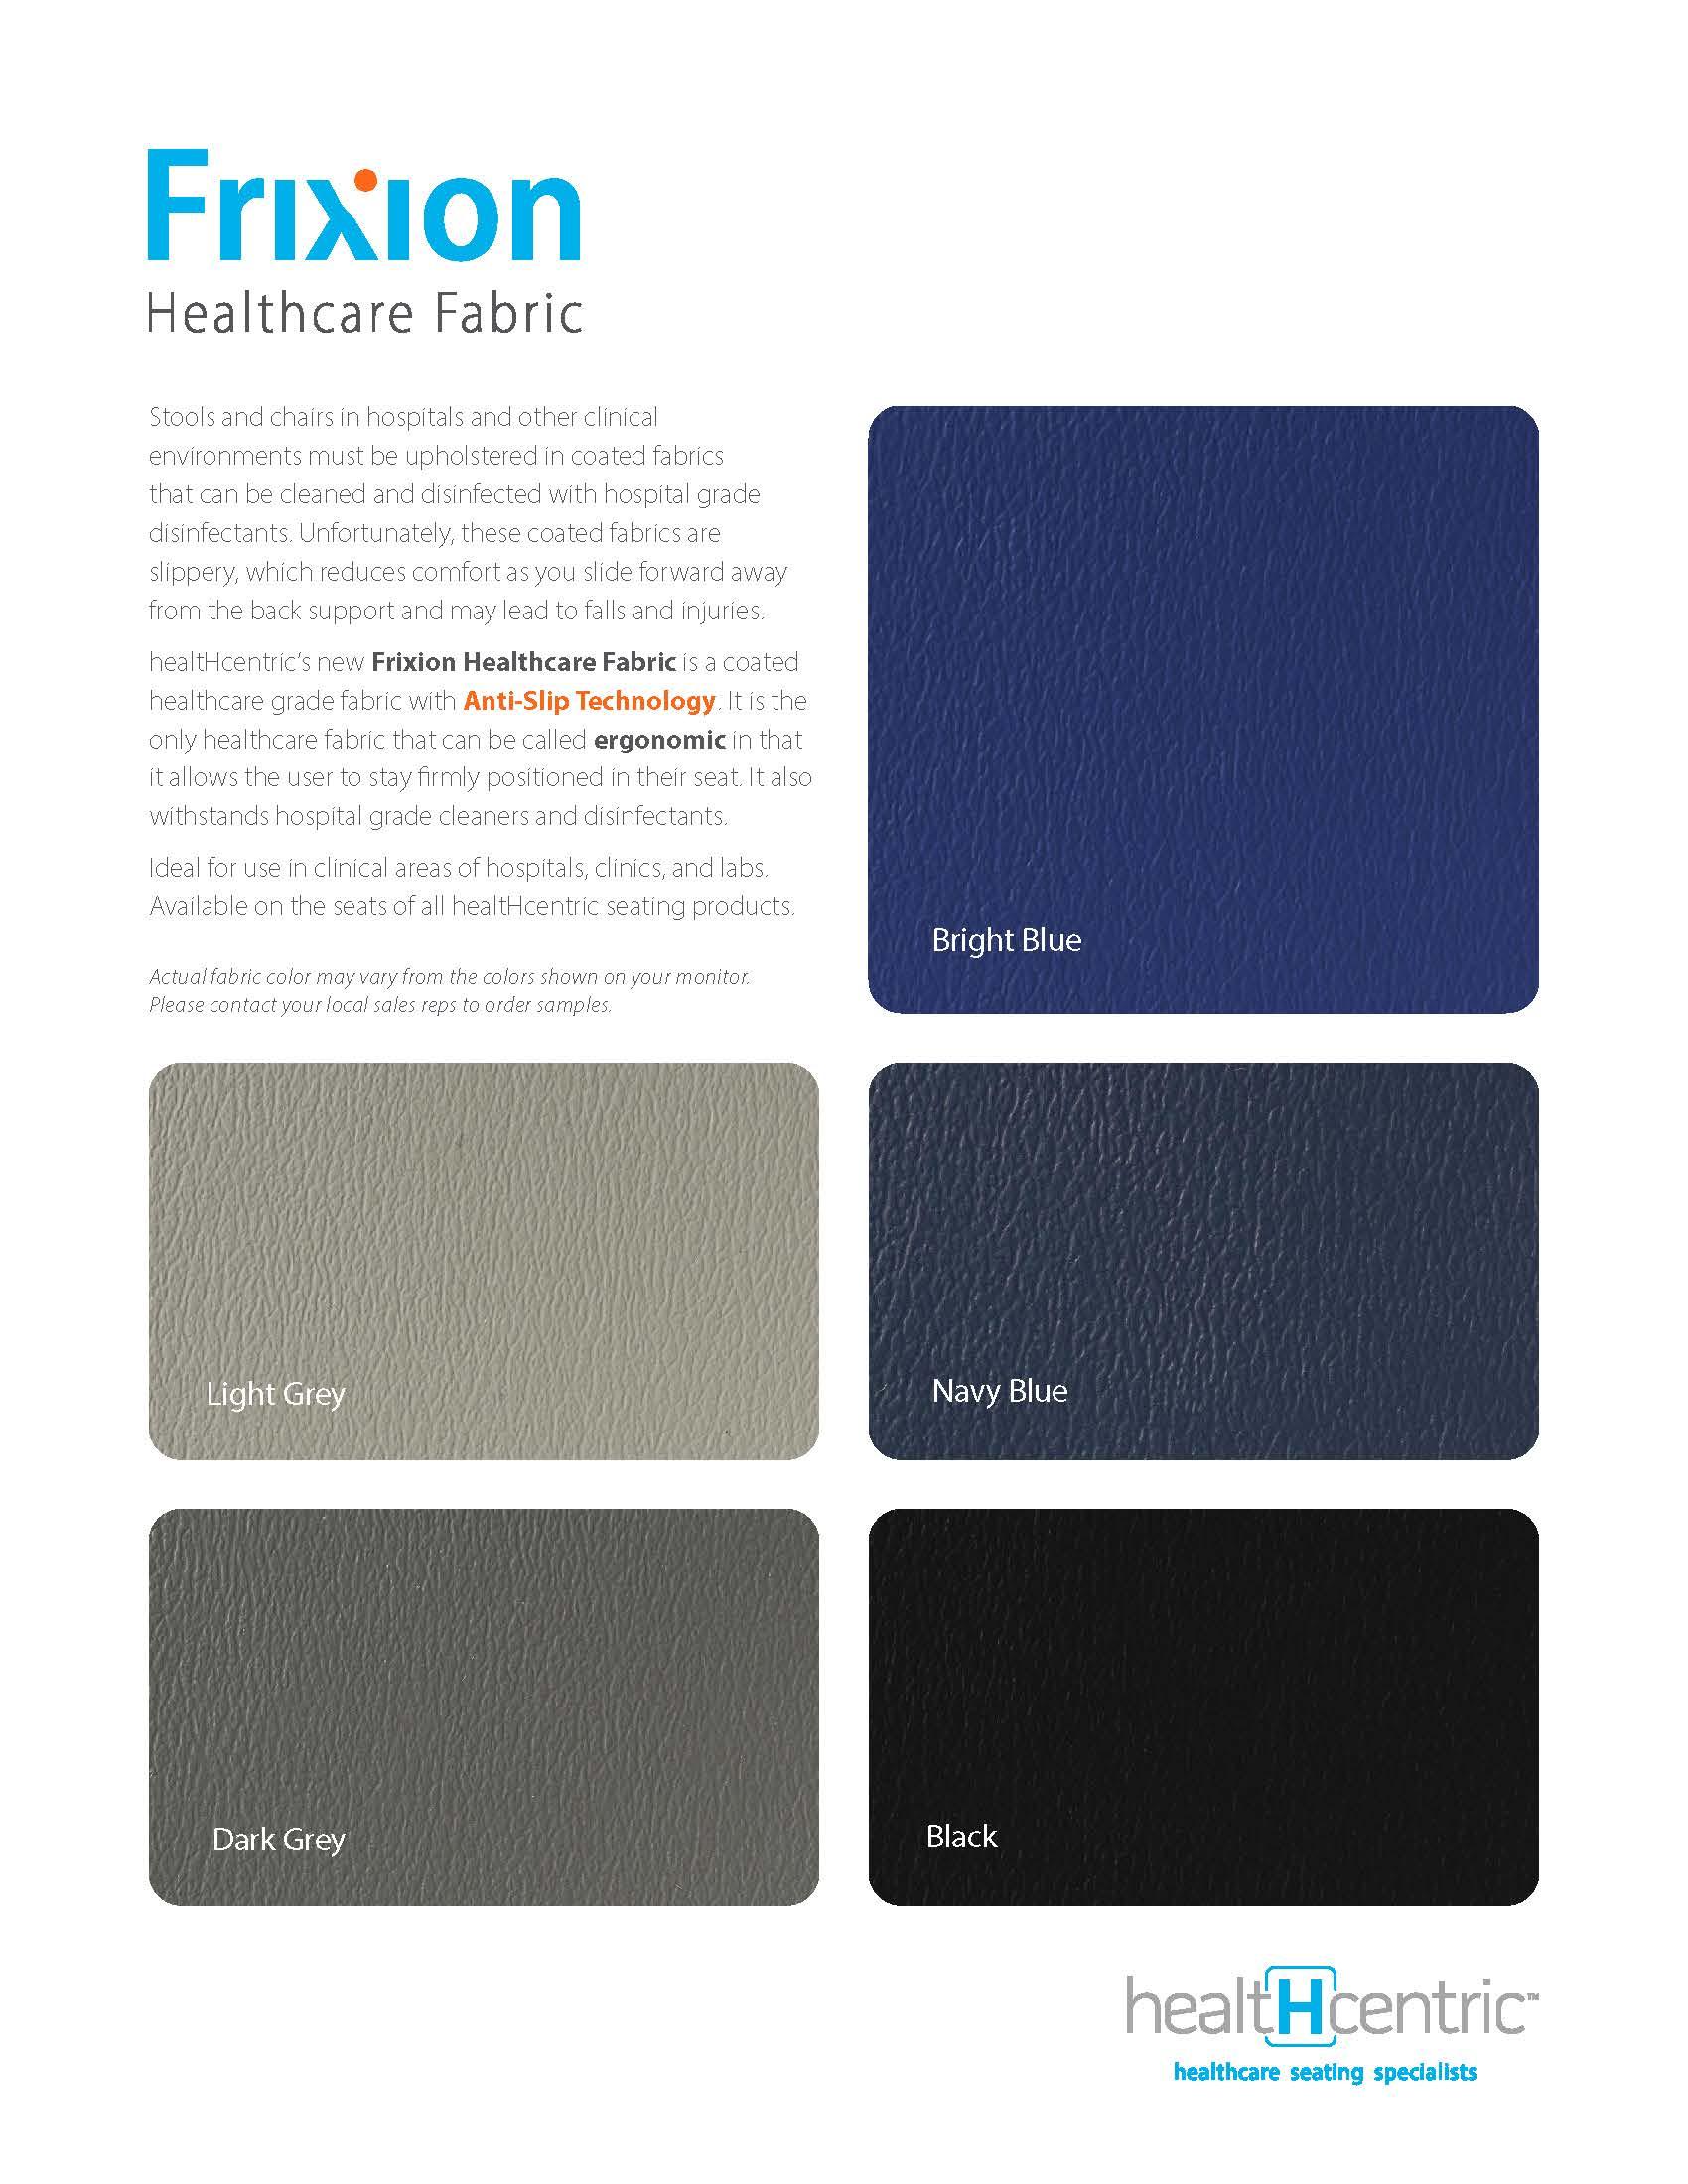 Frixion Healthcare Fabric Grade 6